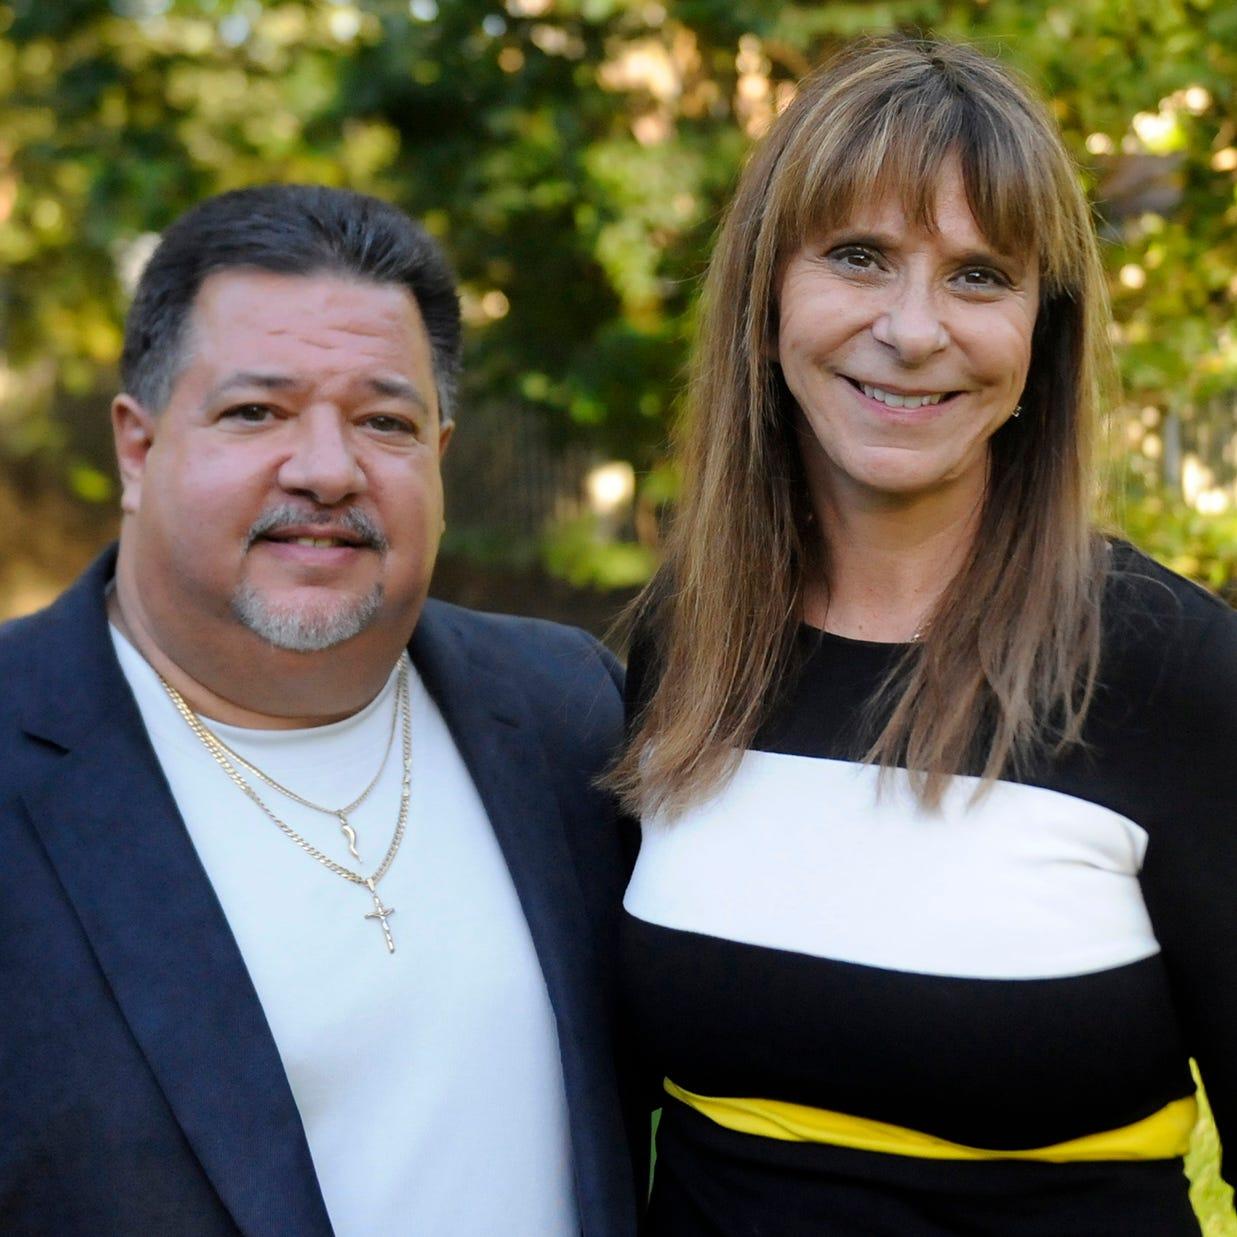 Sandra Forosisky, Robert Penza named Italian heritage award winners